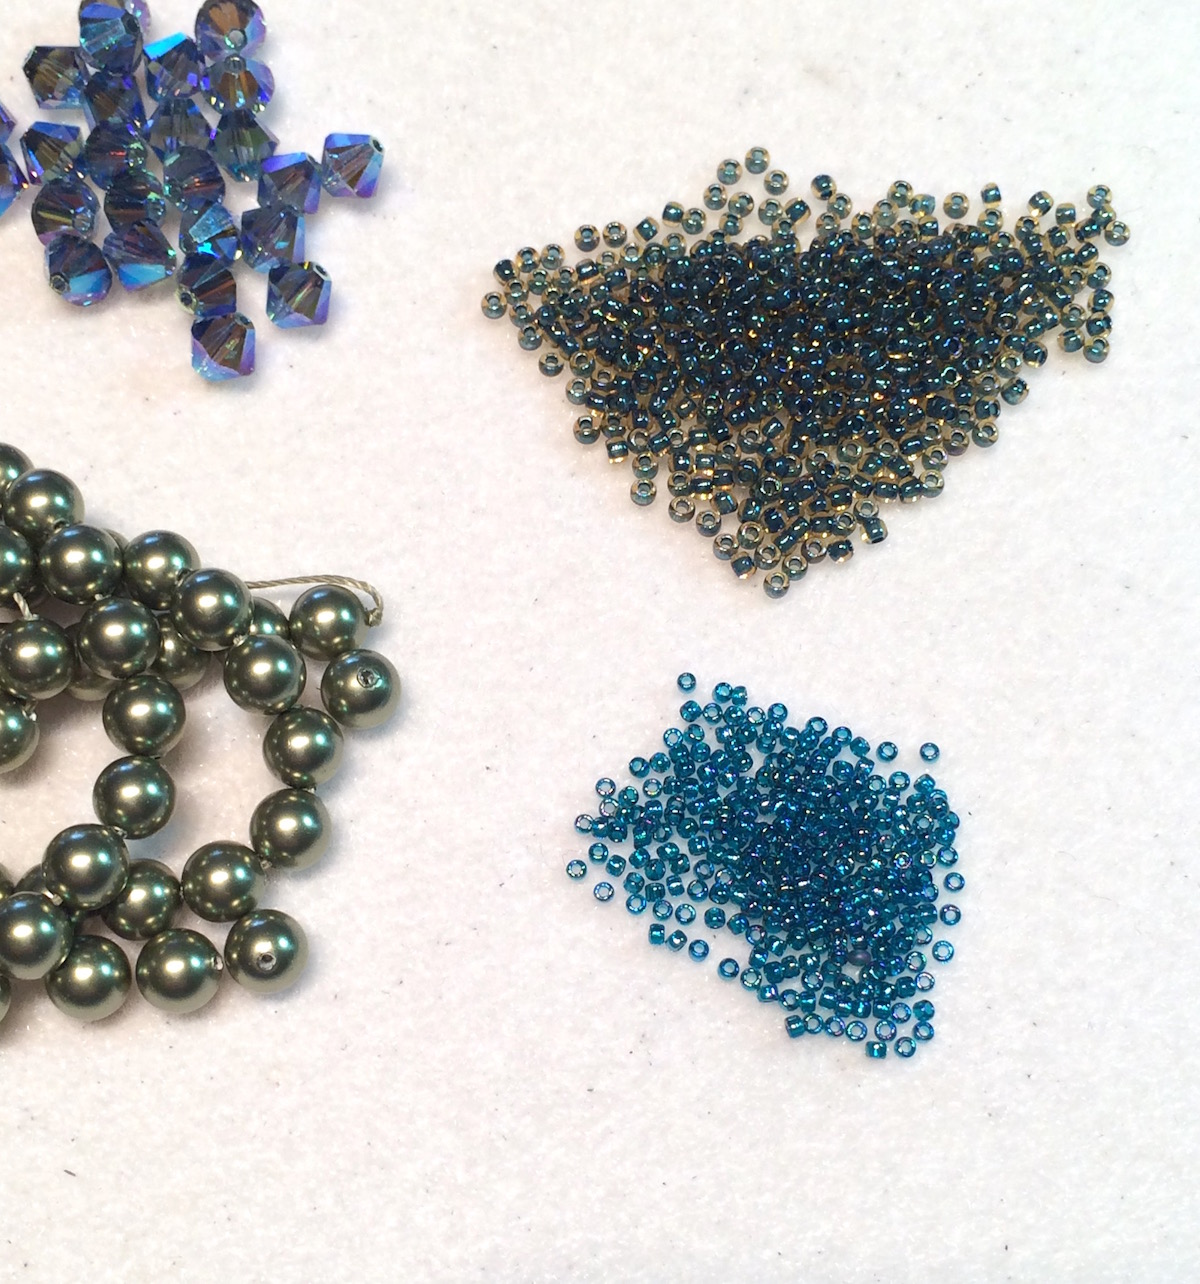 seed beads - check!